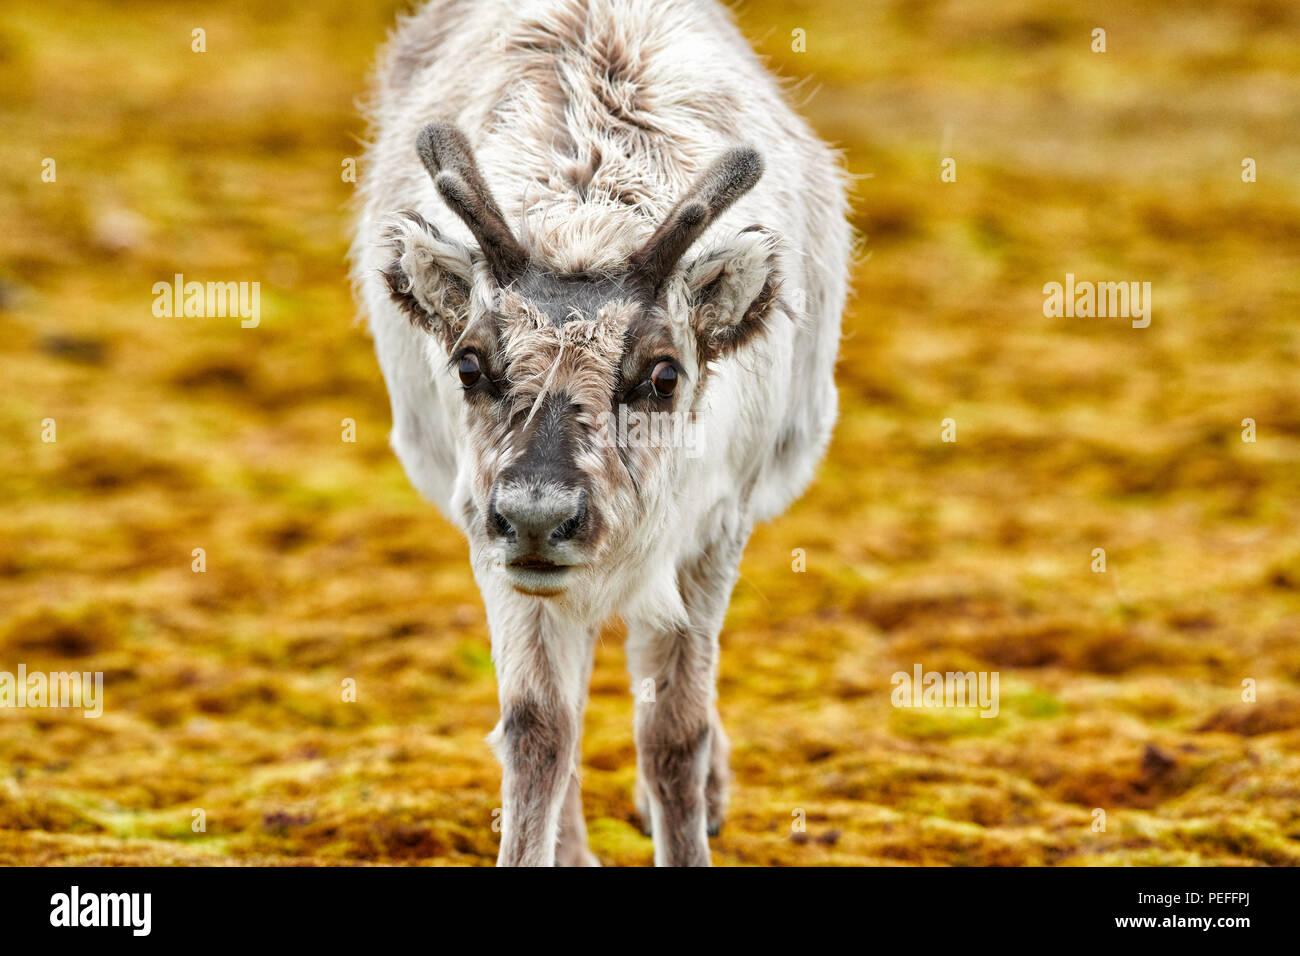 inquisitive young Svalbard reindeer (Rangifer tarandus platyrhynchus), Svalbard or Spitsbergen, Europe - Stock Image